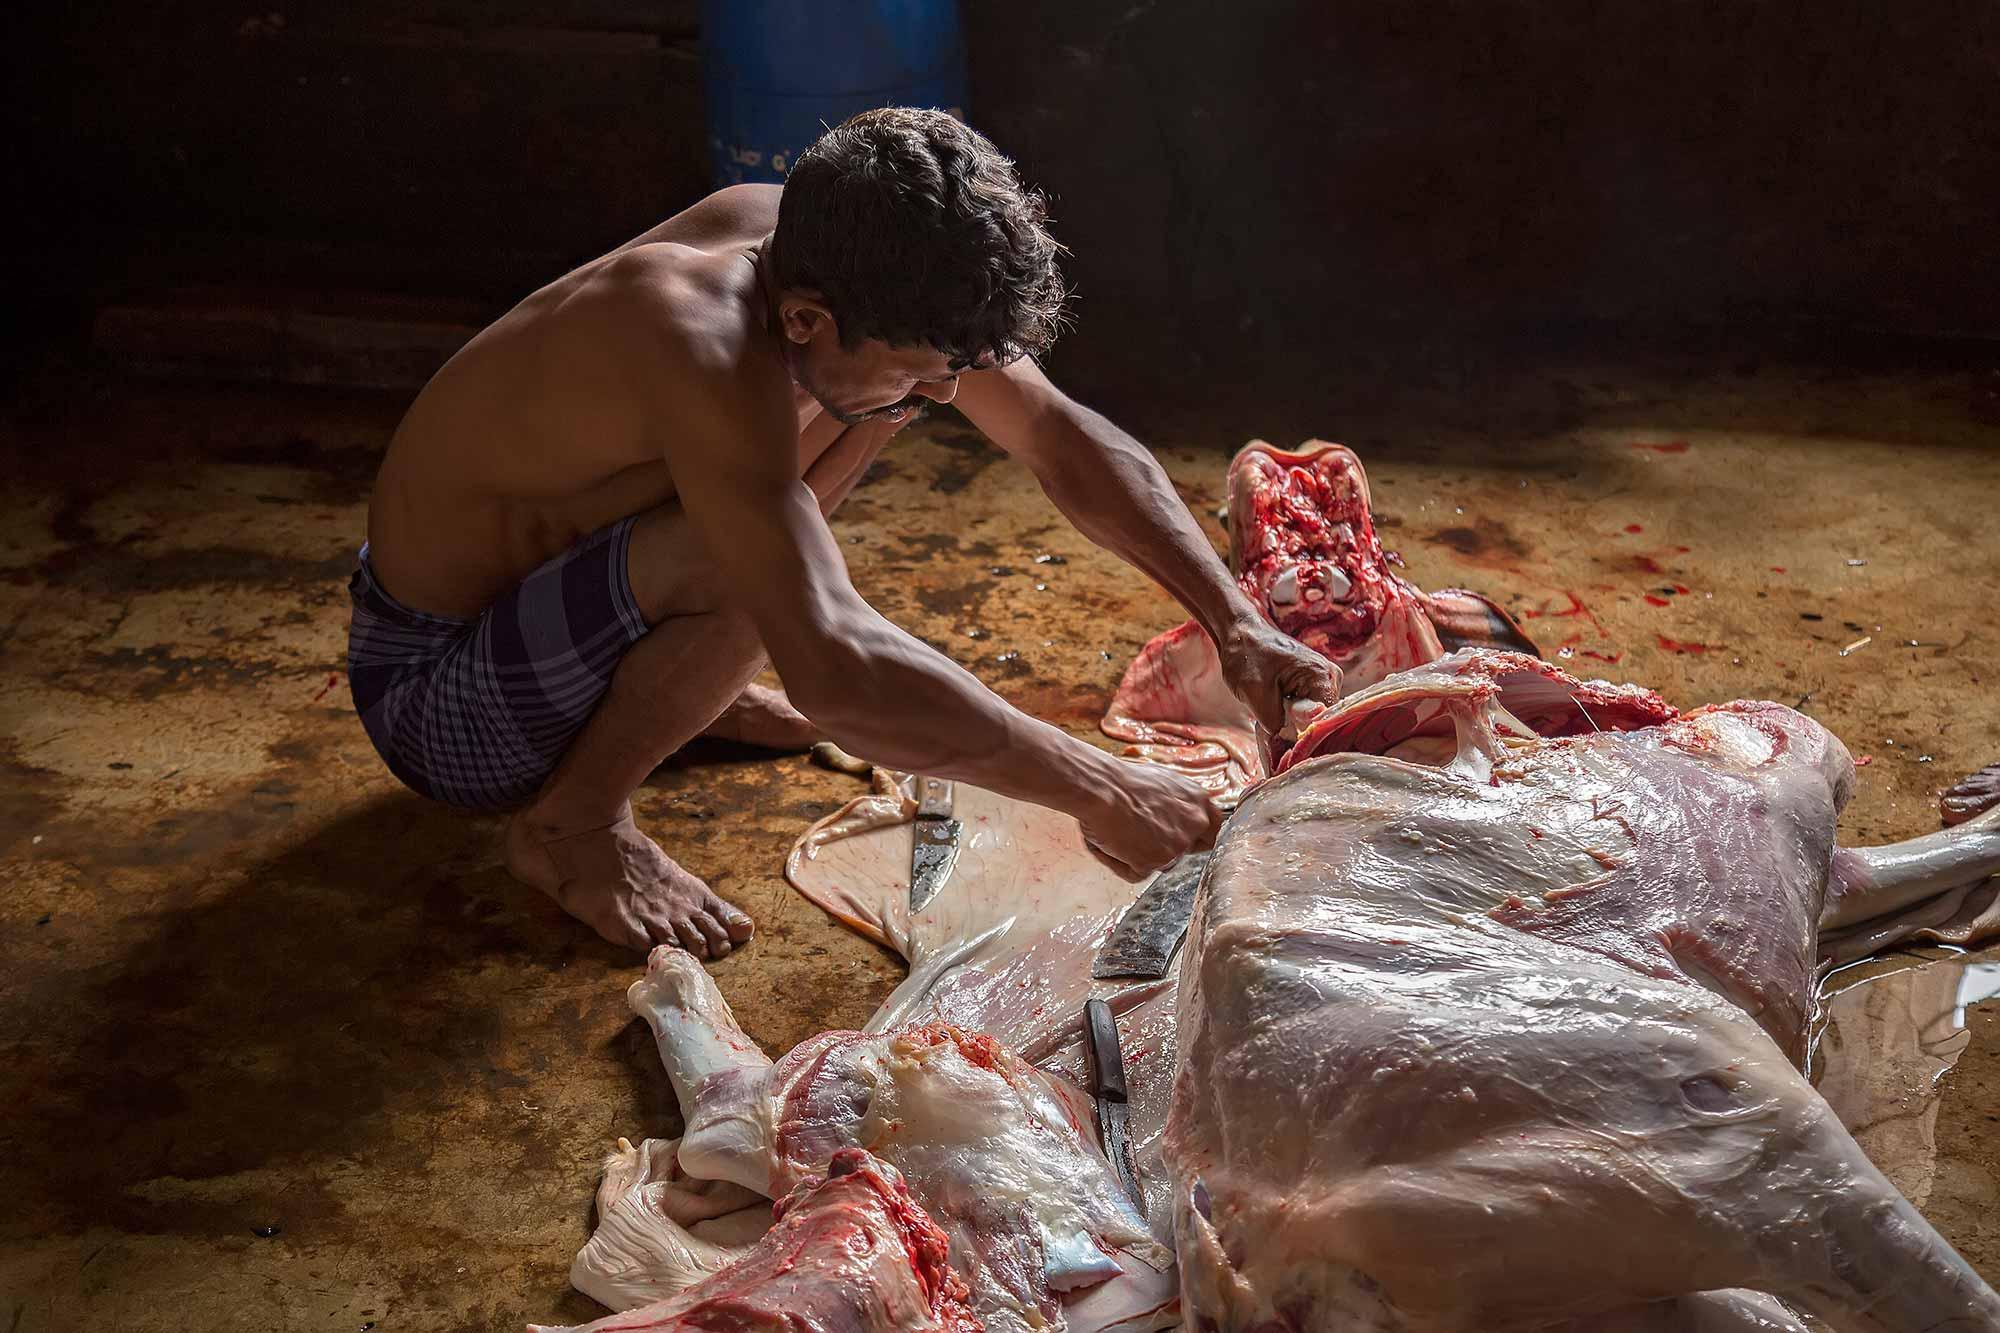 At the slaughter house near the market in Sreemangal, Bangladesh. © Ulli Maier & Nisa Maier